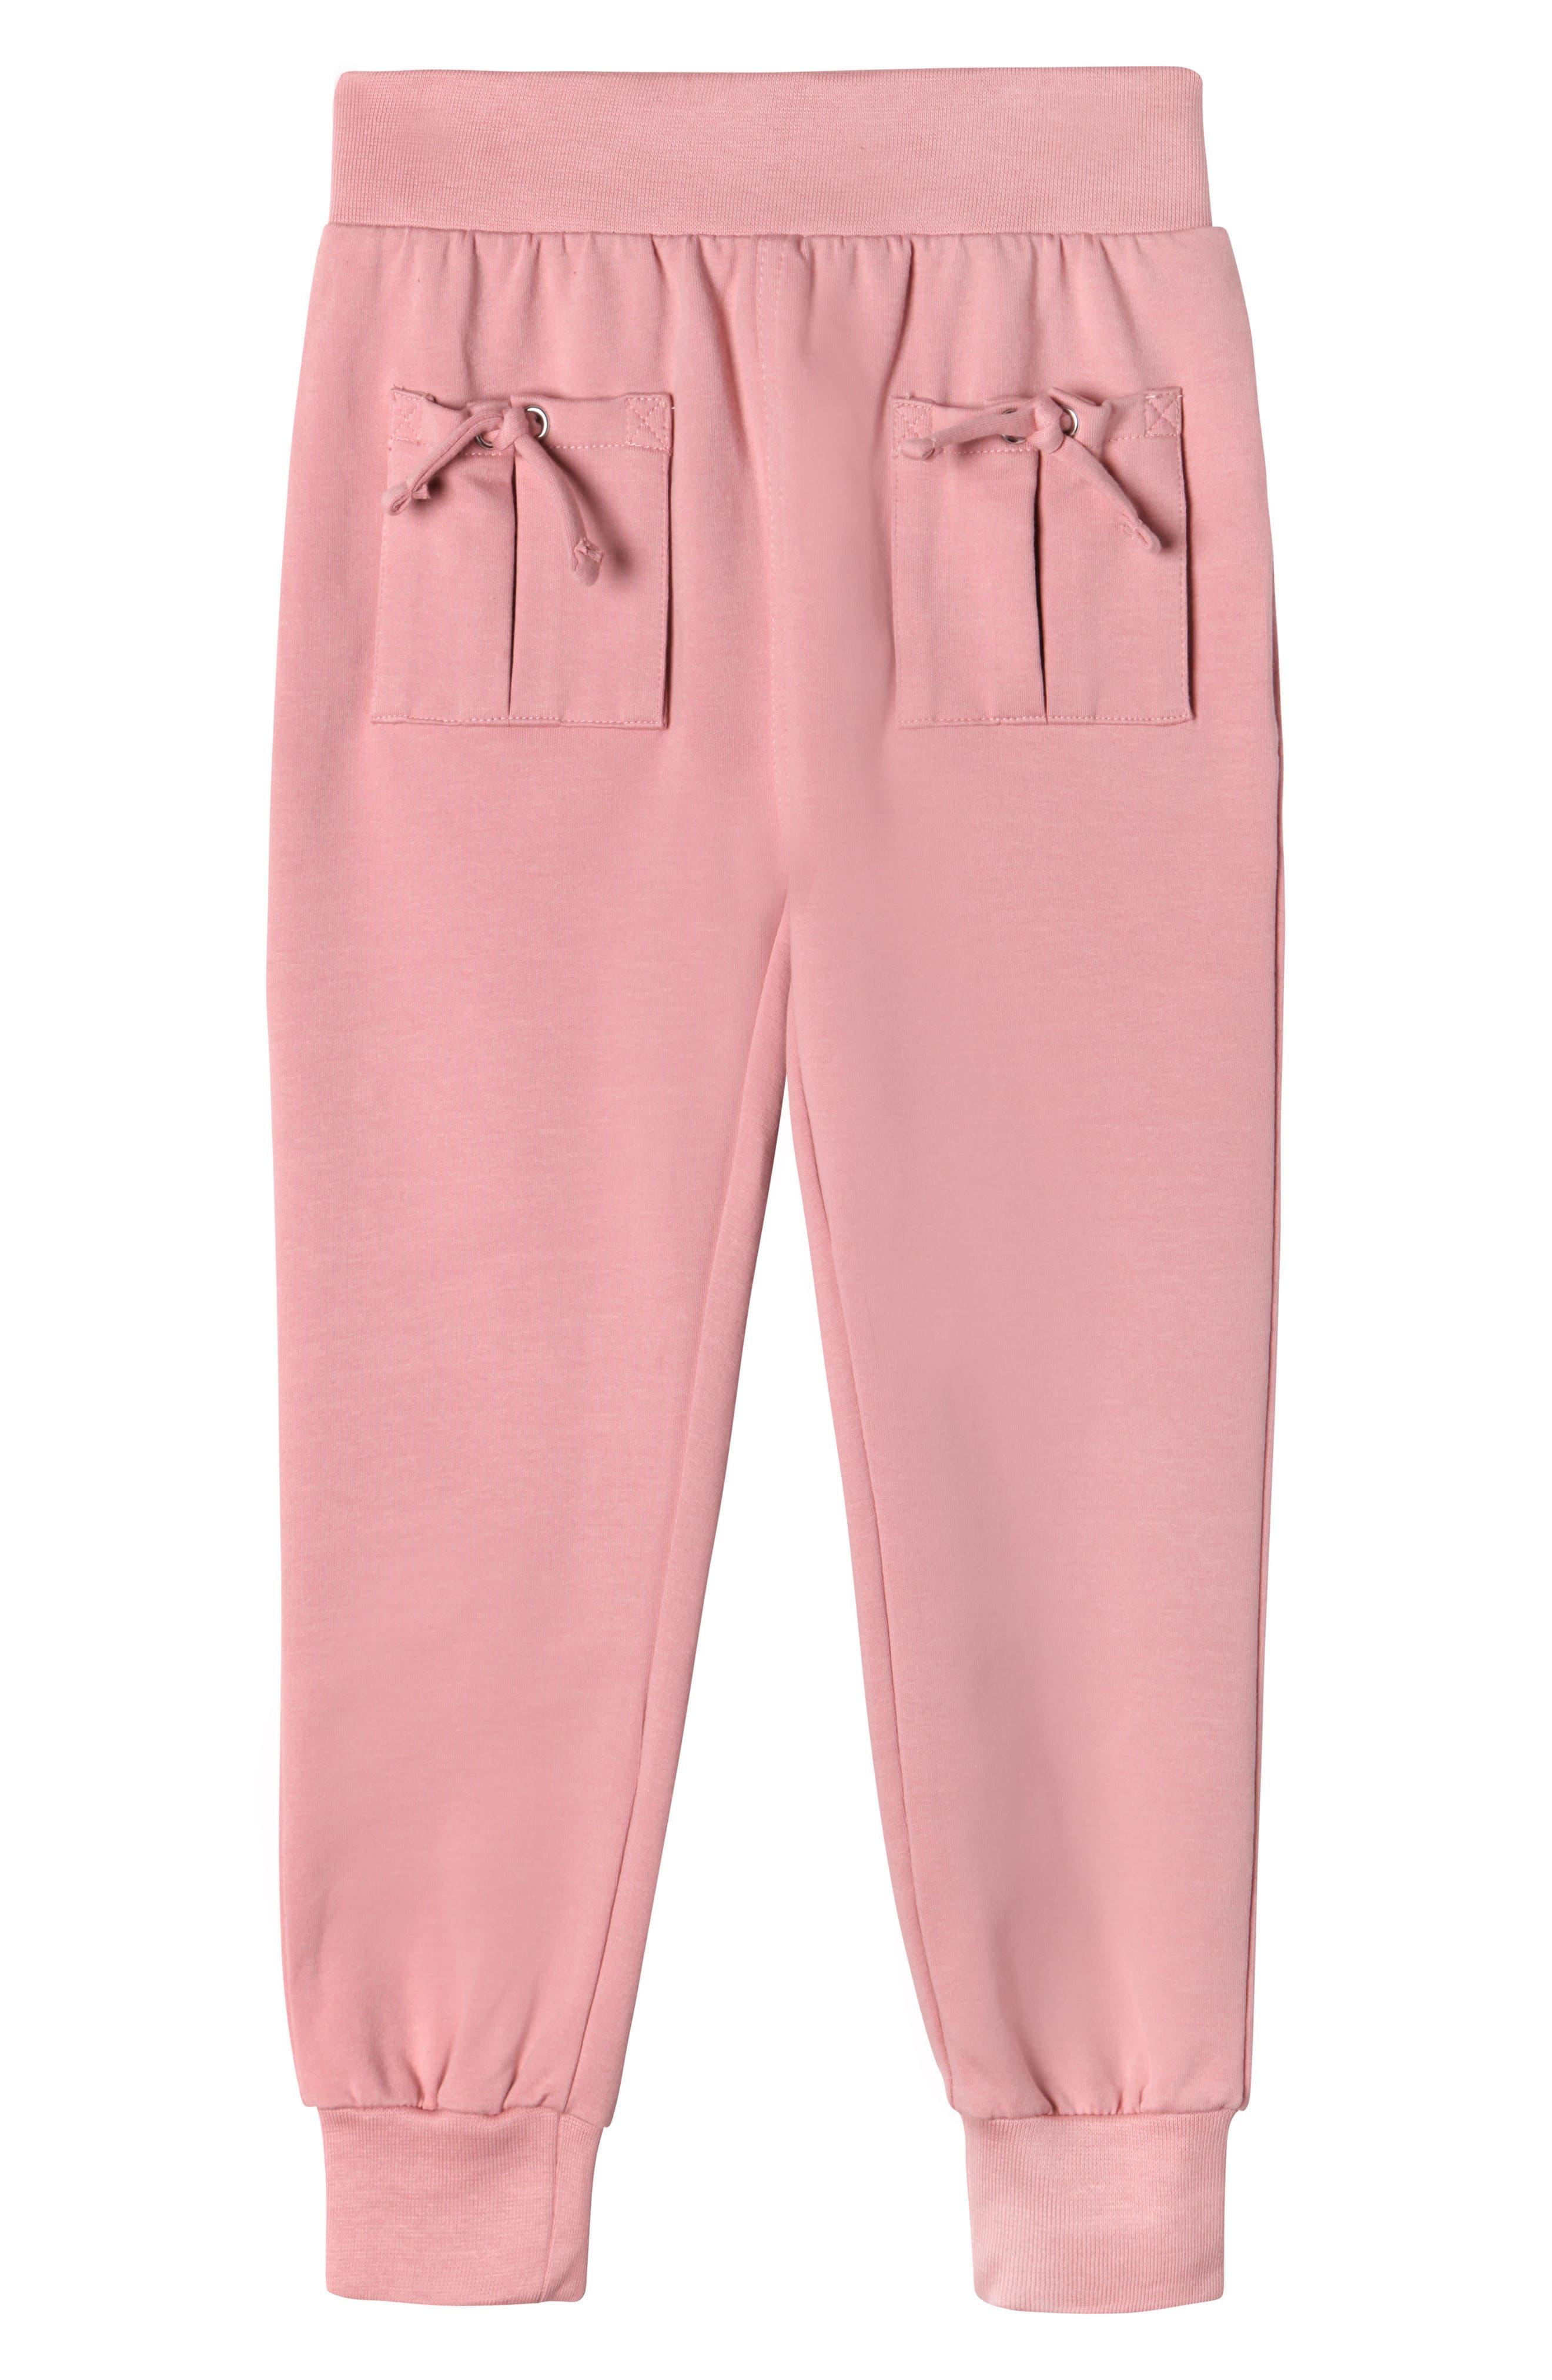 Alternate Image 1 Selected - Art & Eden Aubrey Tie Pocket Sweatpants (Toddler Girls & Little Girls)